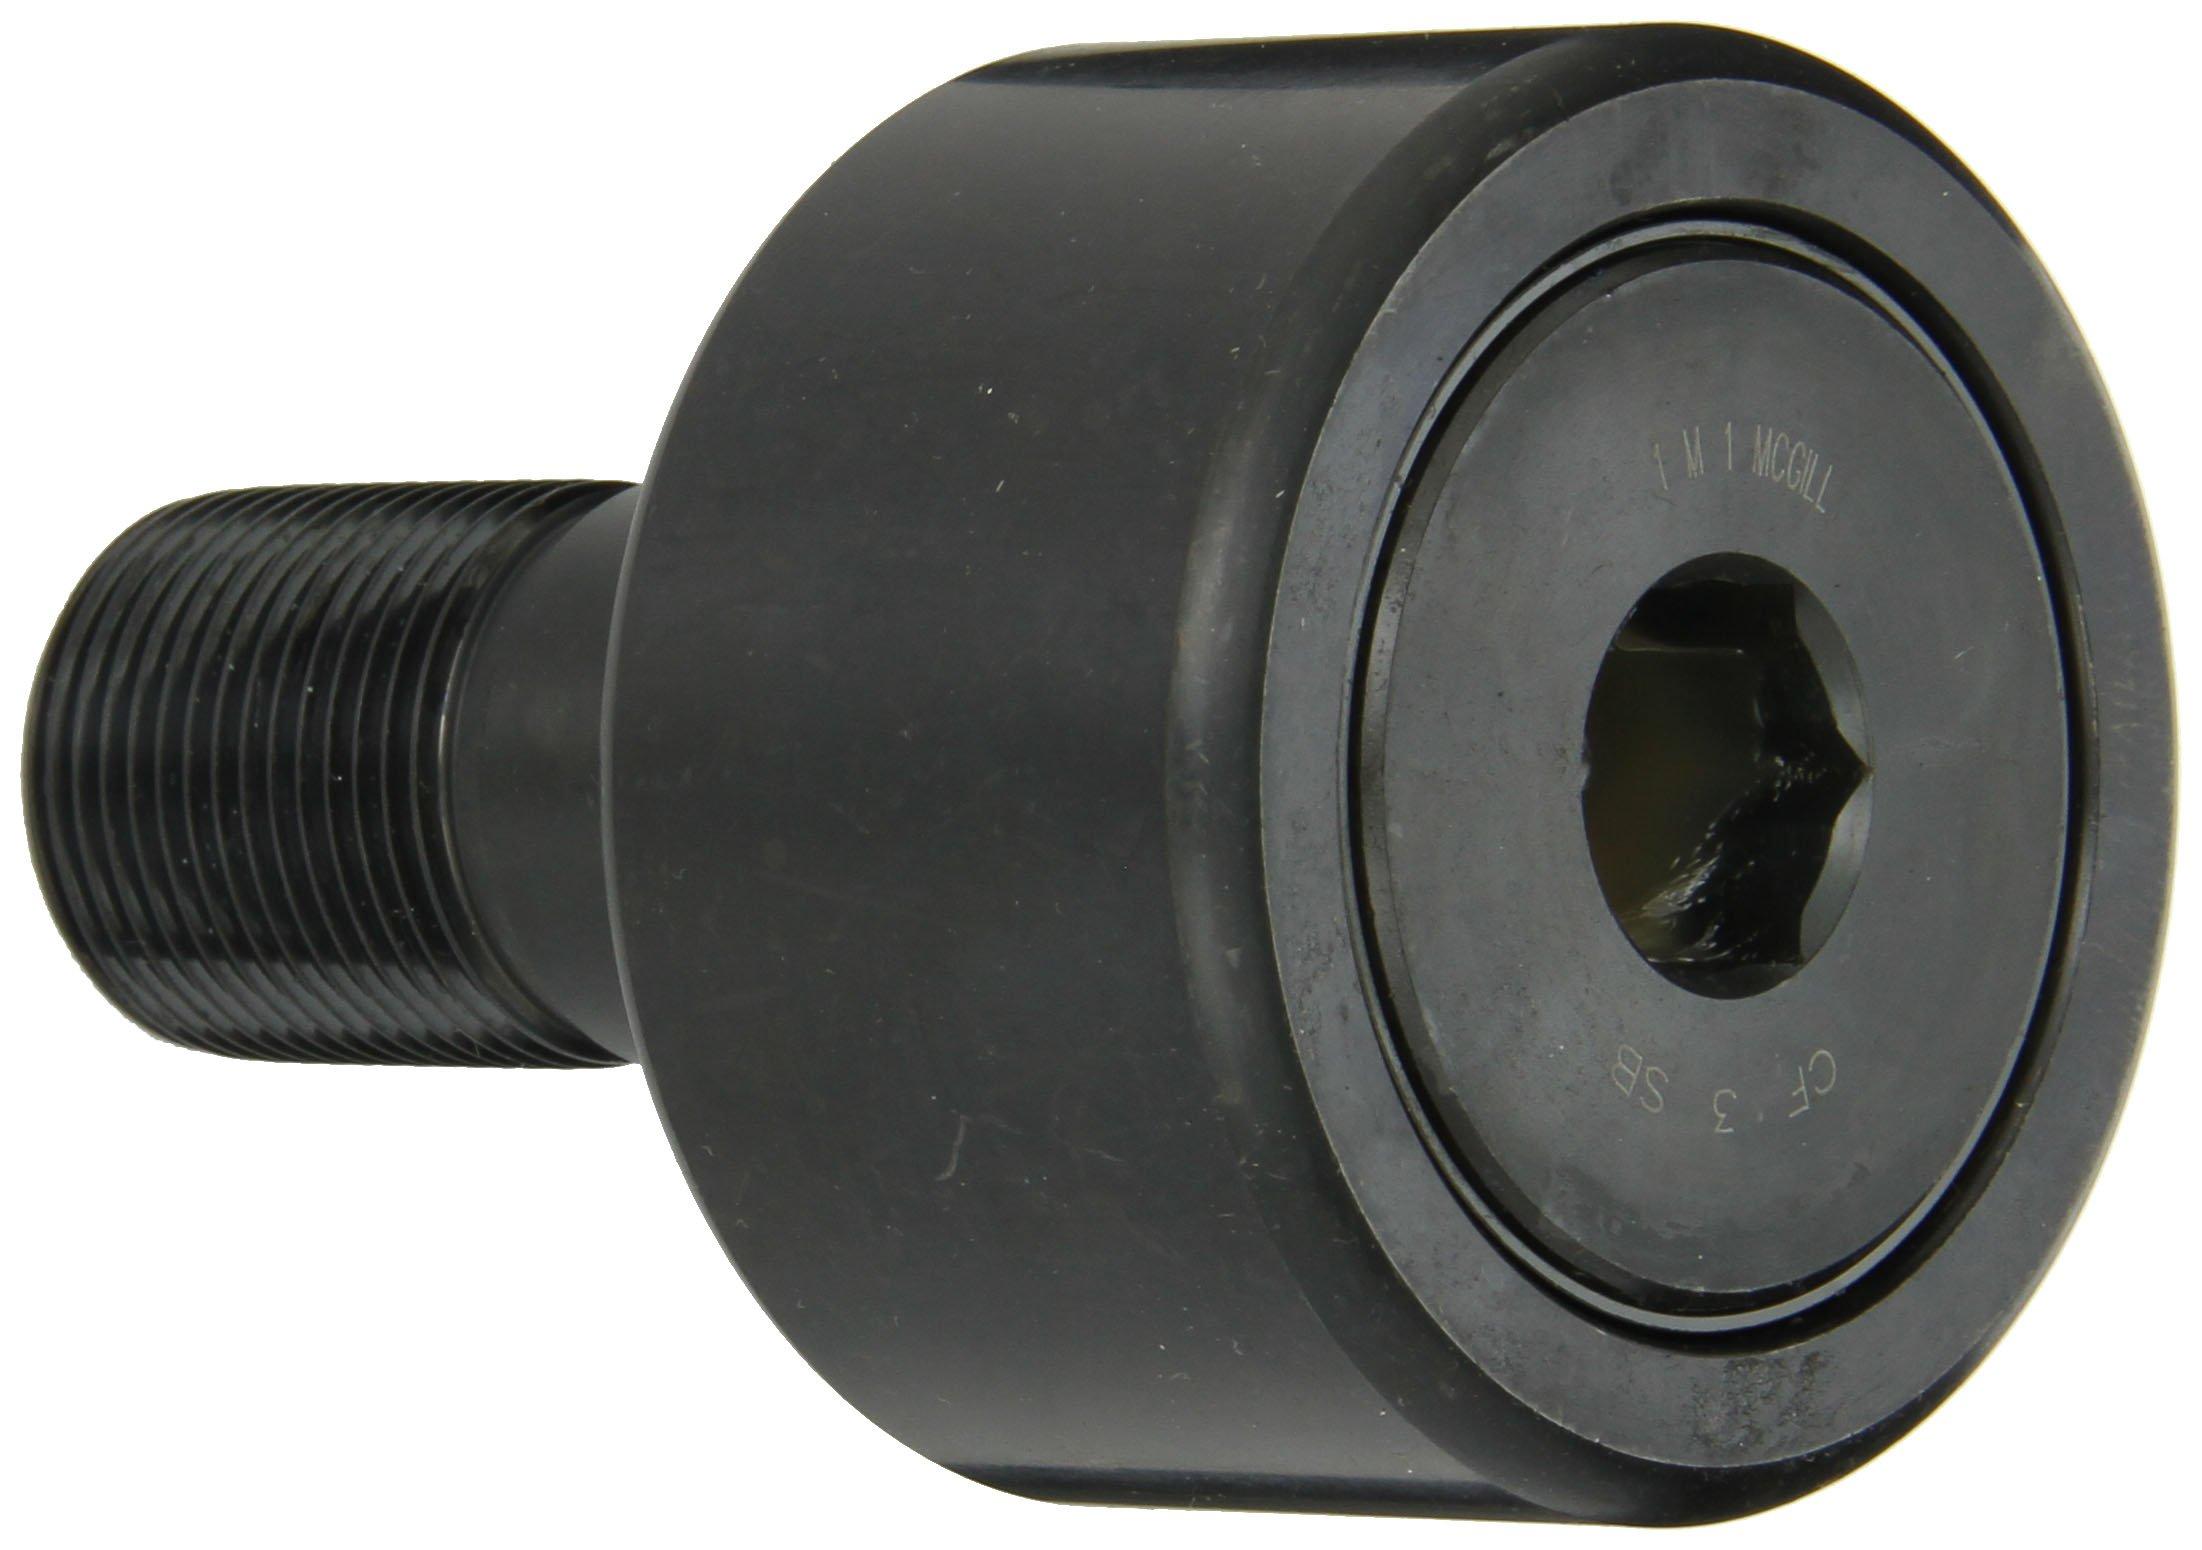 McGill CF3SB Cam Follower, Standard Stud, Sealed/Hex Hole, Inch, Steel, 3'' Roller Diameter, 1-3/4'' Roller Width, 2-1/2'' Stud Length, 1-1/4'' Thread Size, 4-9/32'' Overall Length, 1.250'' Stud Diameter